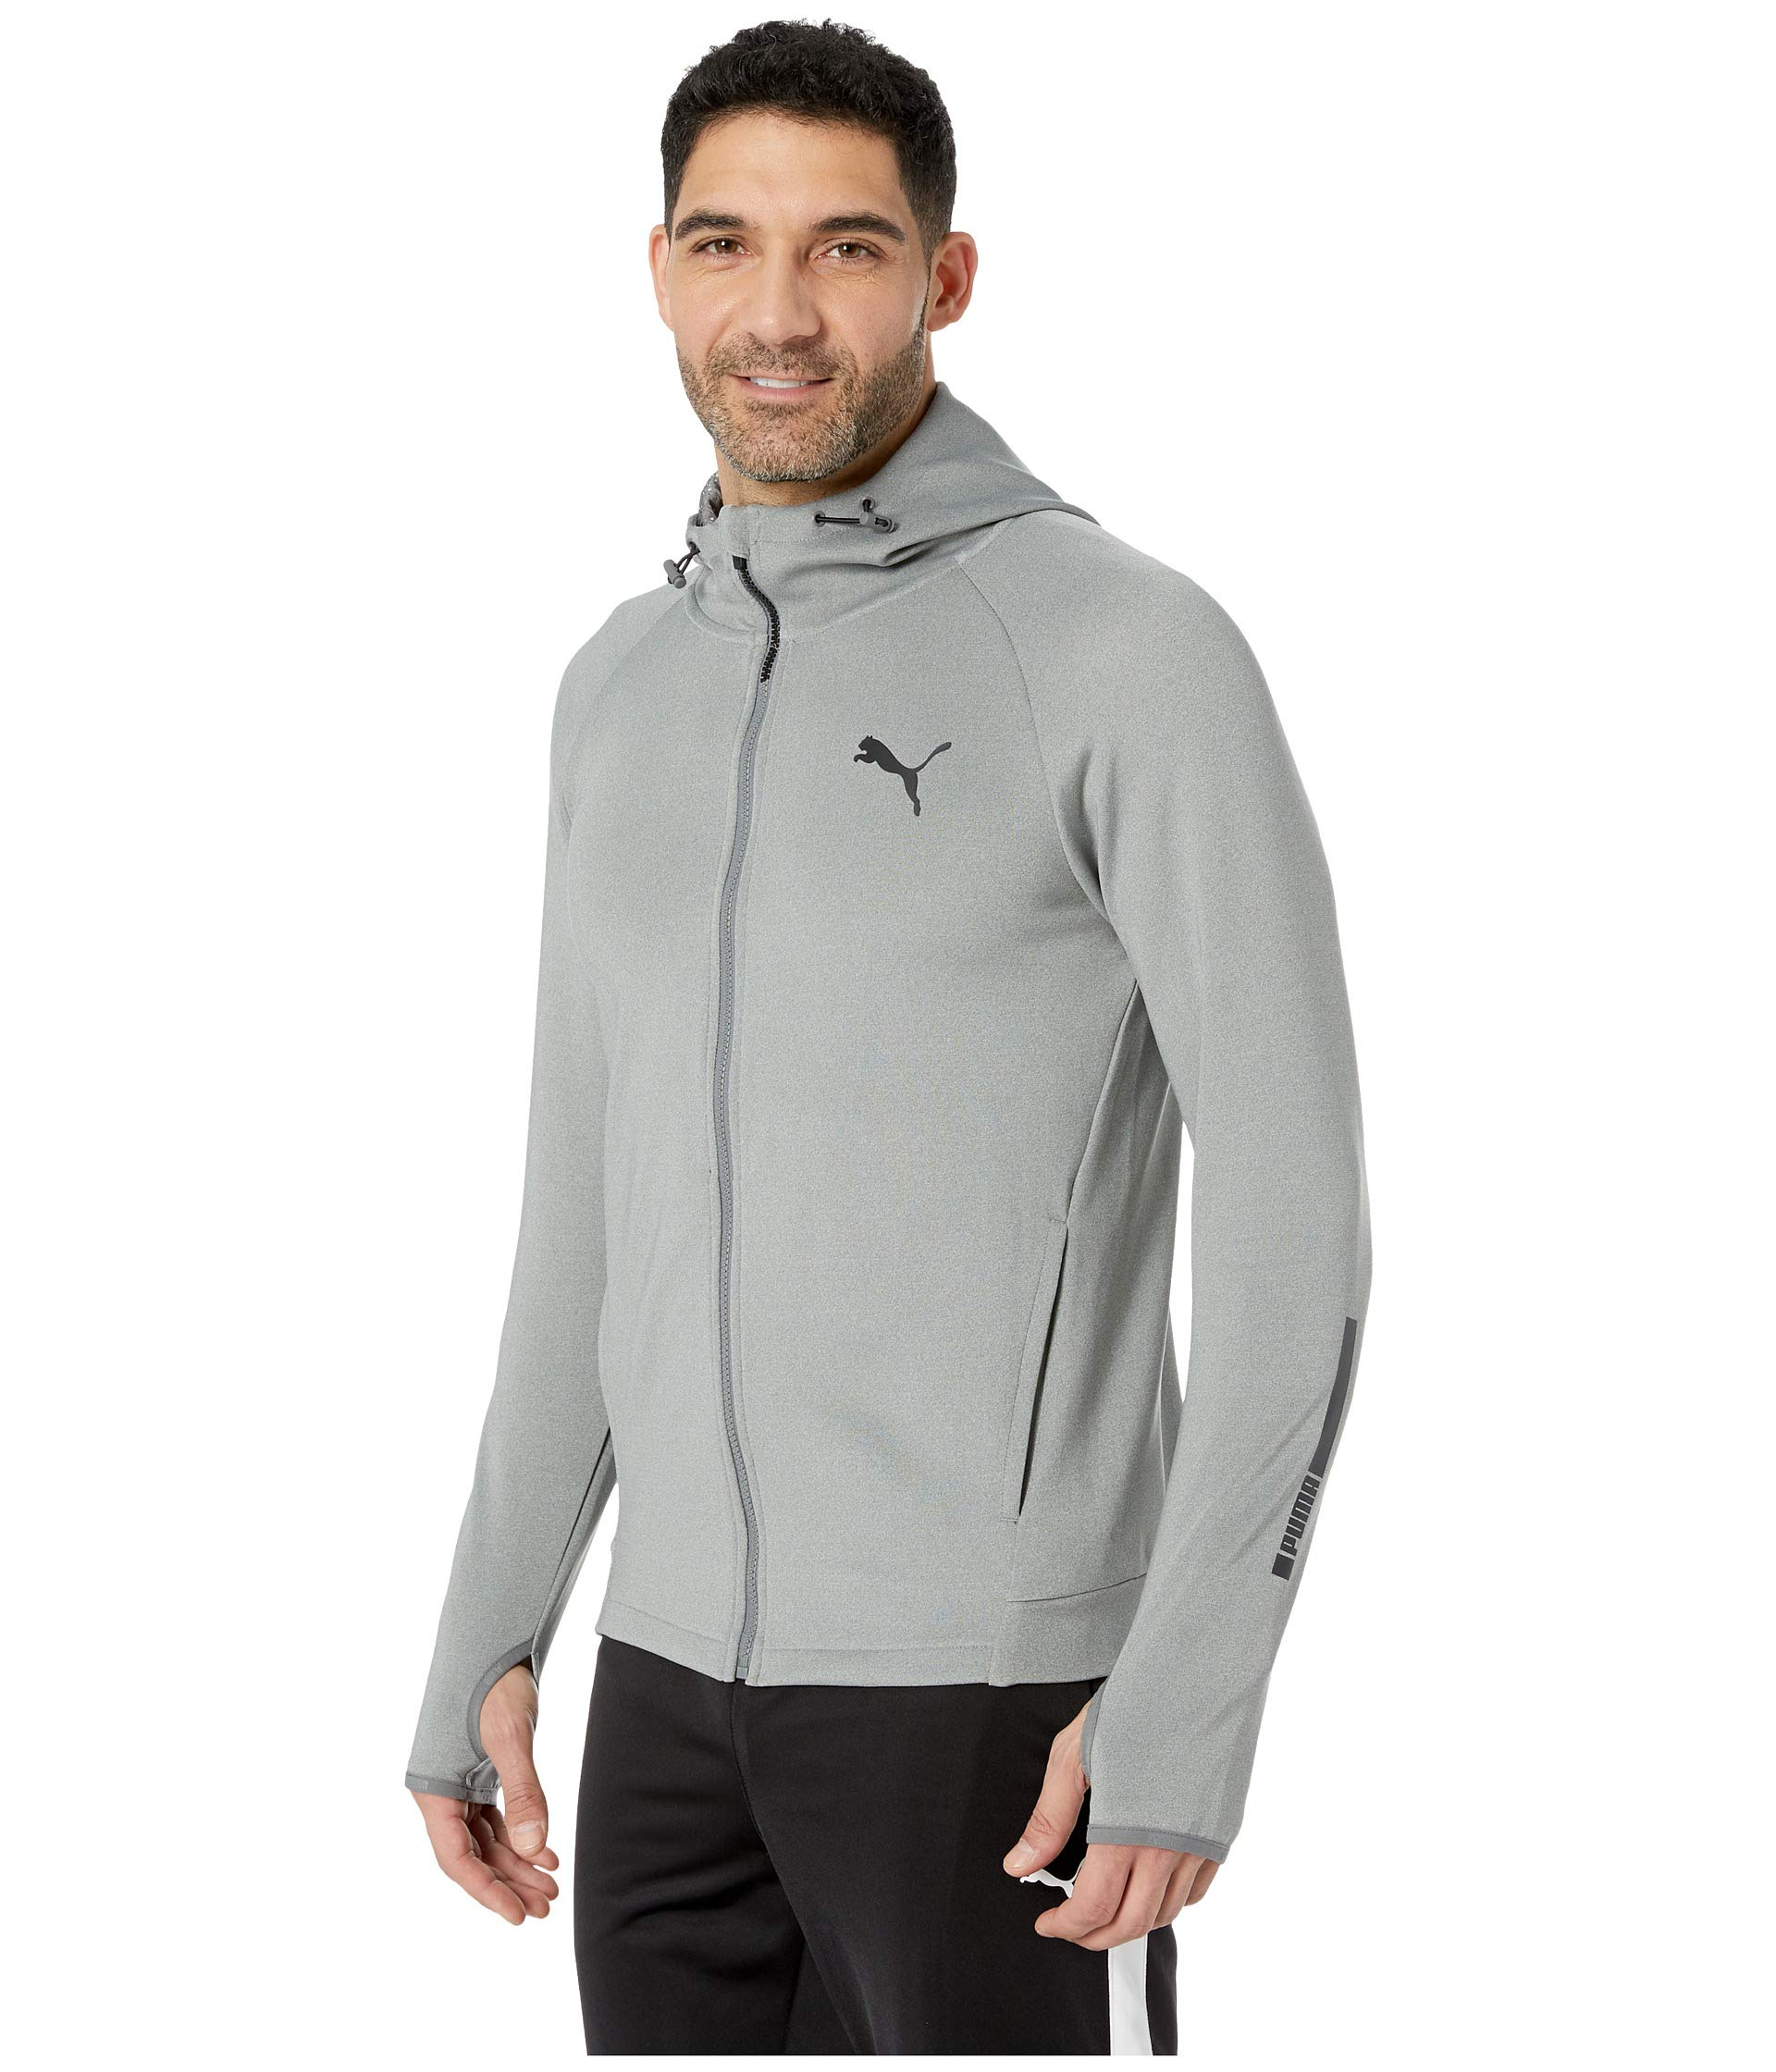 Sports Heather Grey Medium Zip Tec Full Puma Hoodie qHxp50w5A